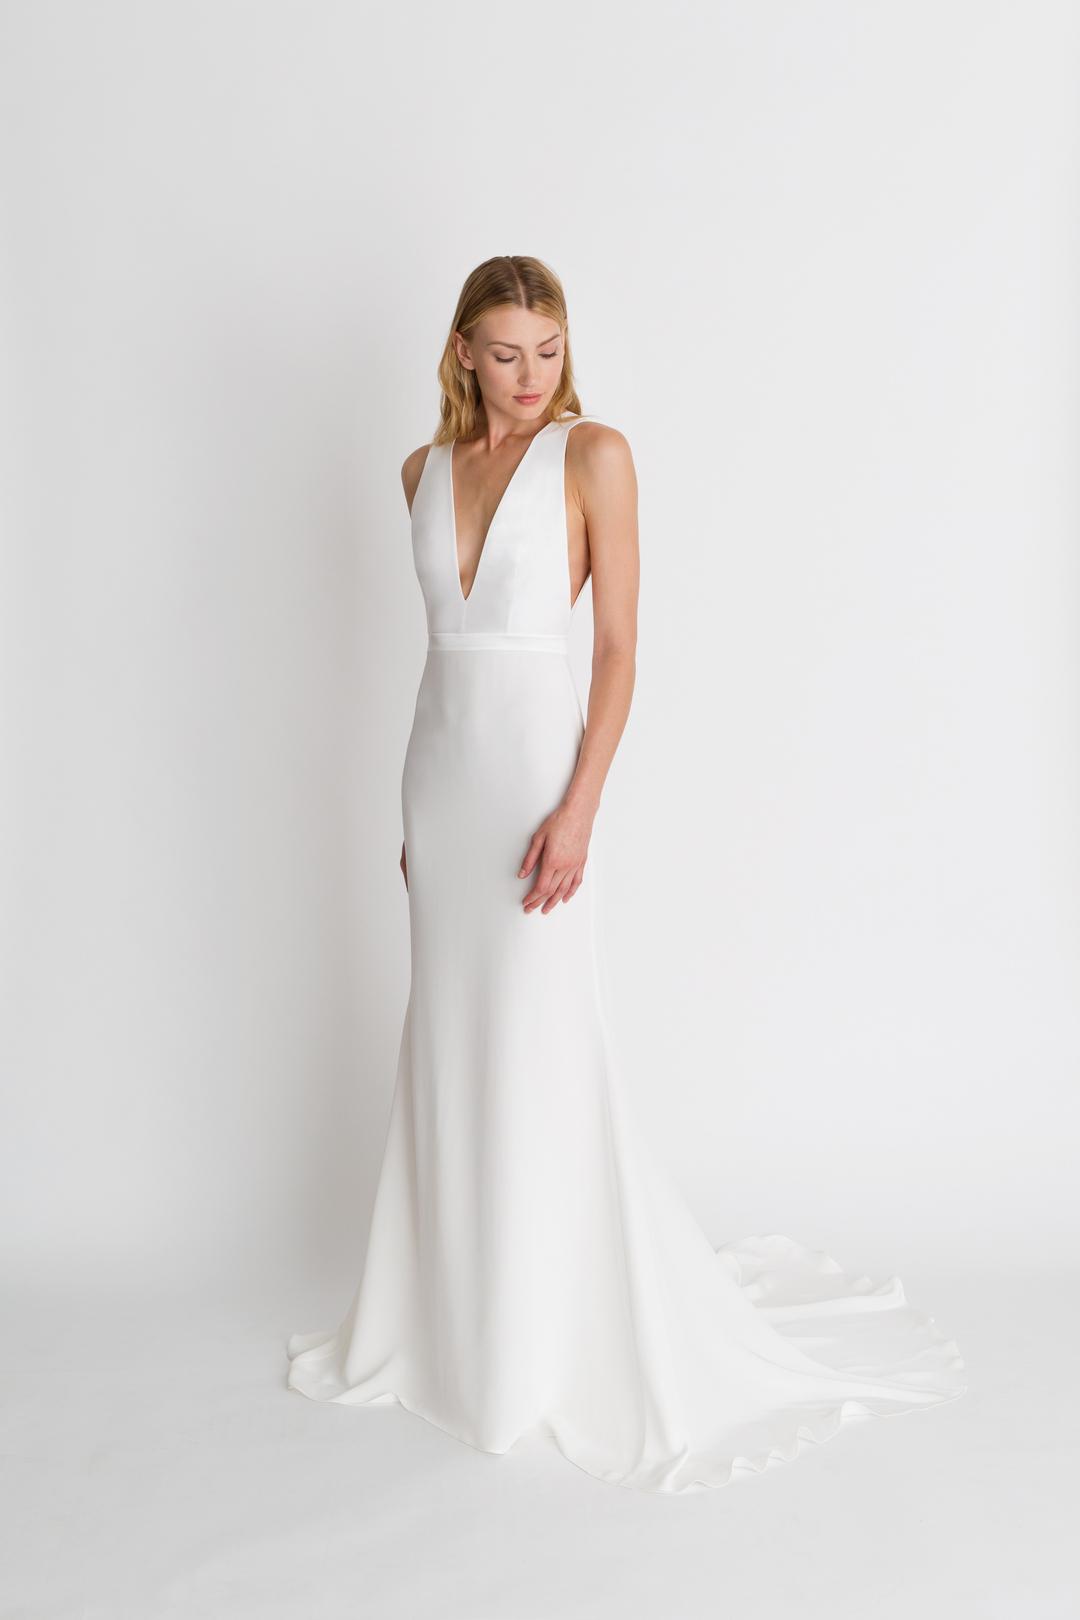 Dress main 2x 1543696996